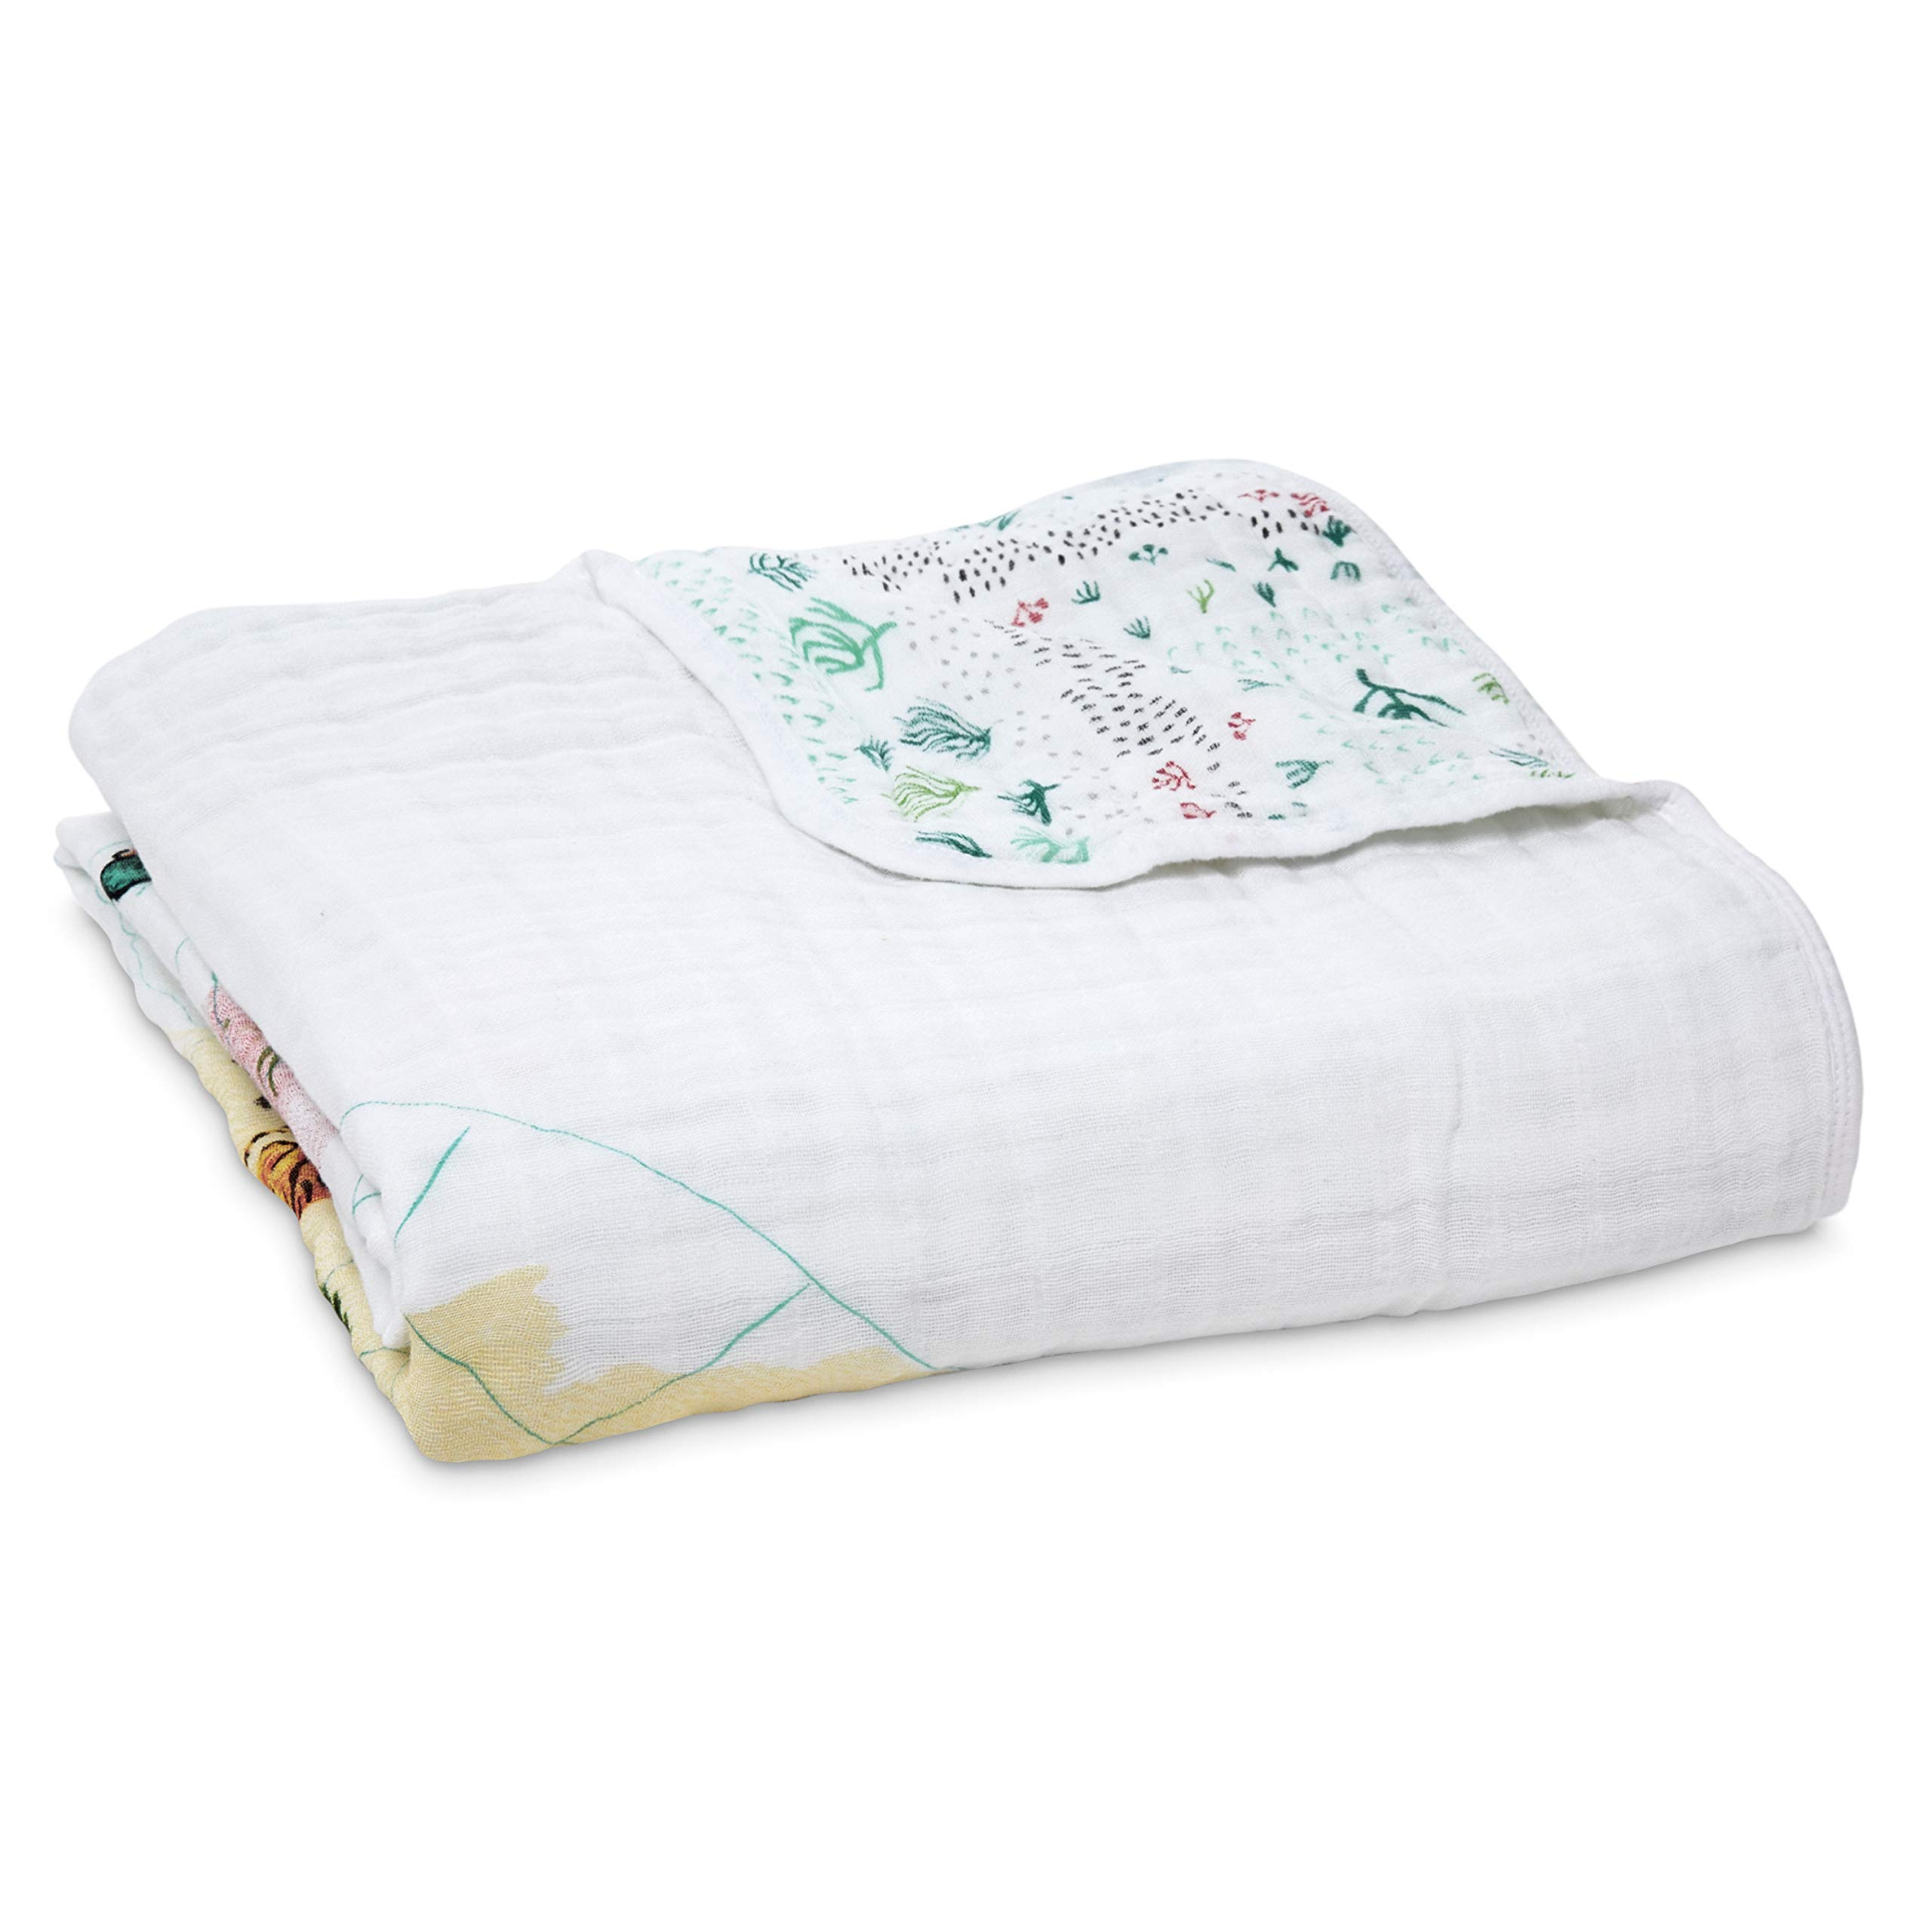 aden + anais Dream Blanket | Boutique Muslin Baby Blankets for Girls & Boys |Ideal Lightweight Newborn Nursery & Crib Blanket|Unisex Toddler & Infant Bedding, Shower & Registry Gift, Around The World by aden + anais